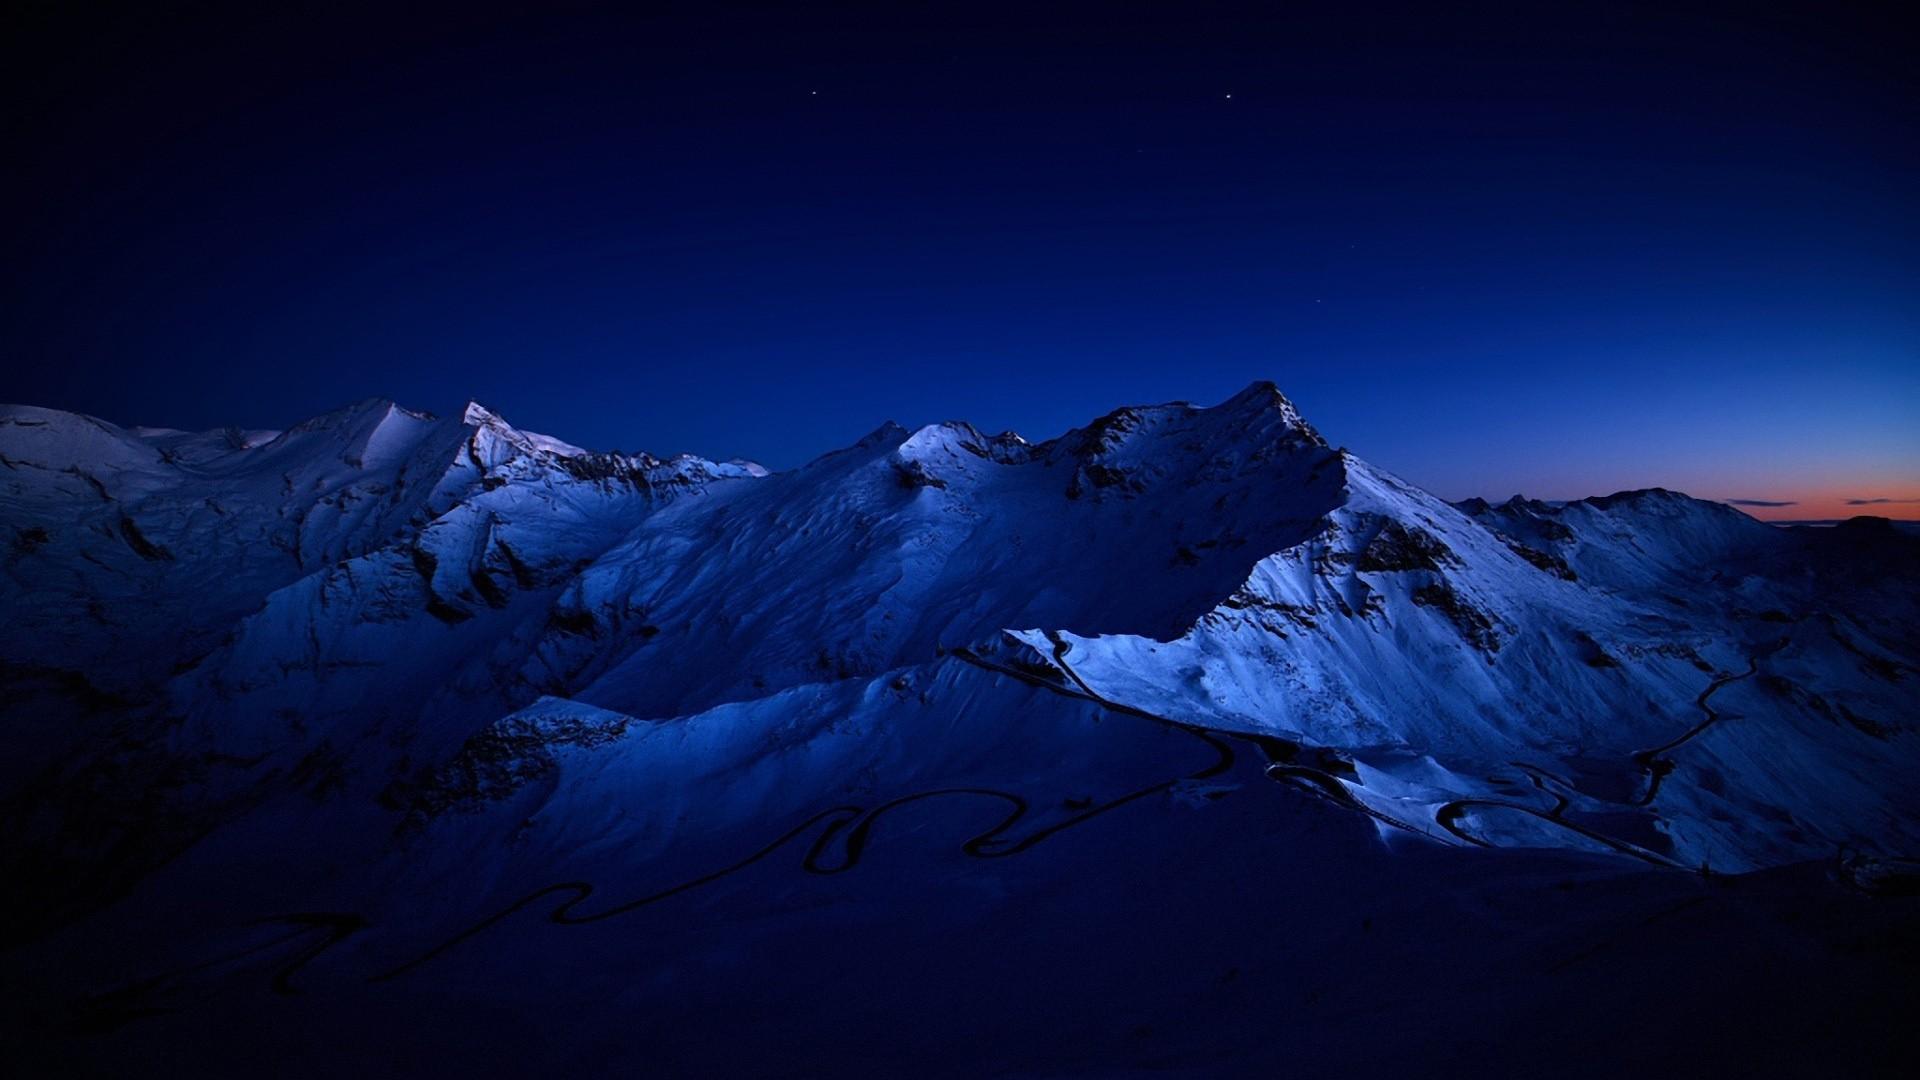 Dark Mountain Wallpaper for pc